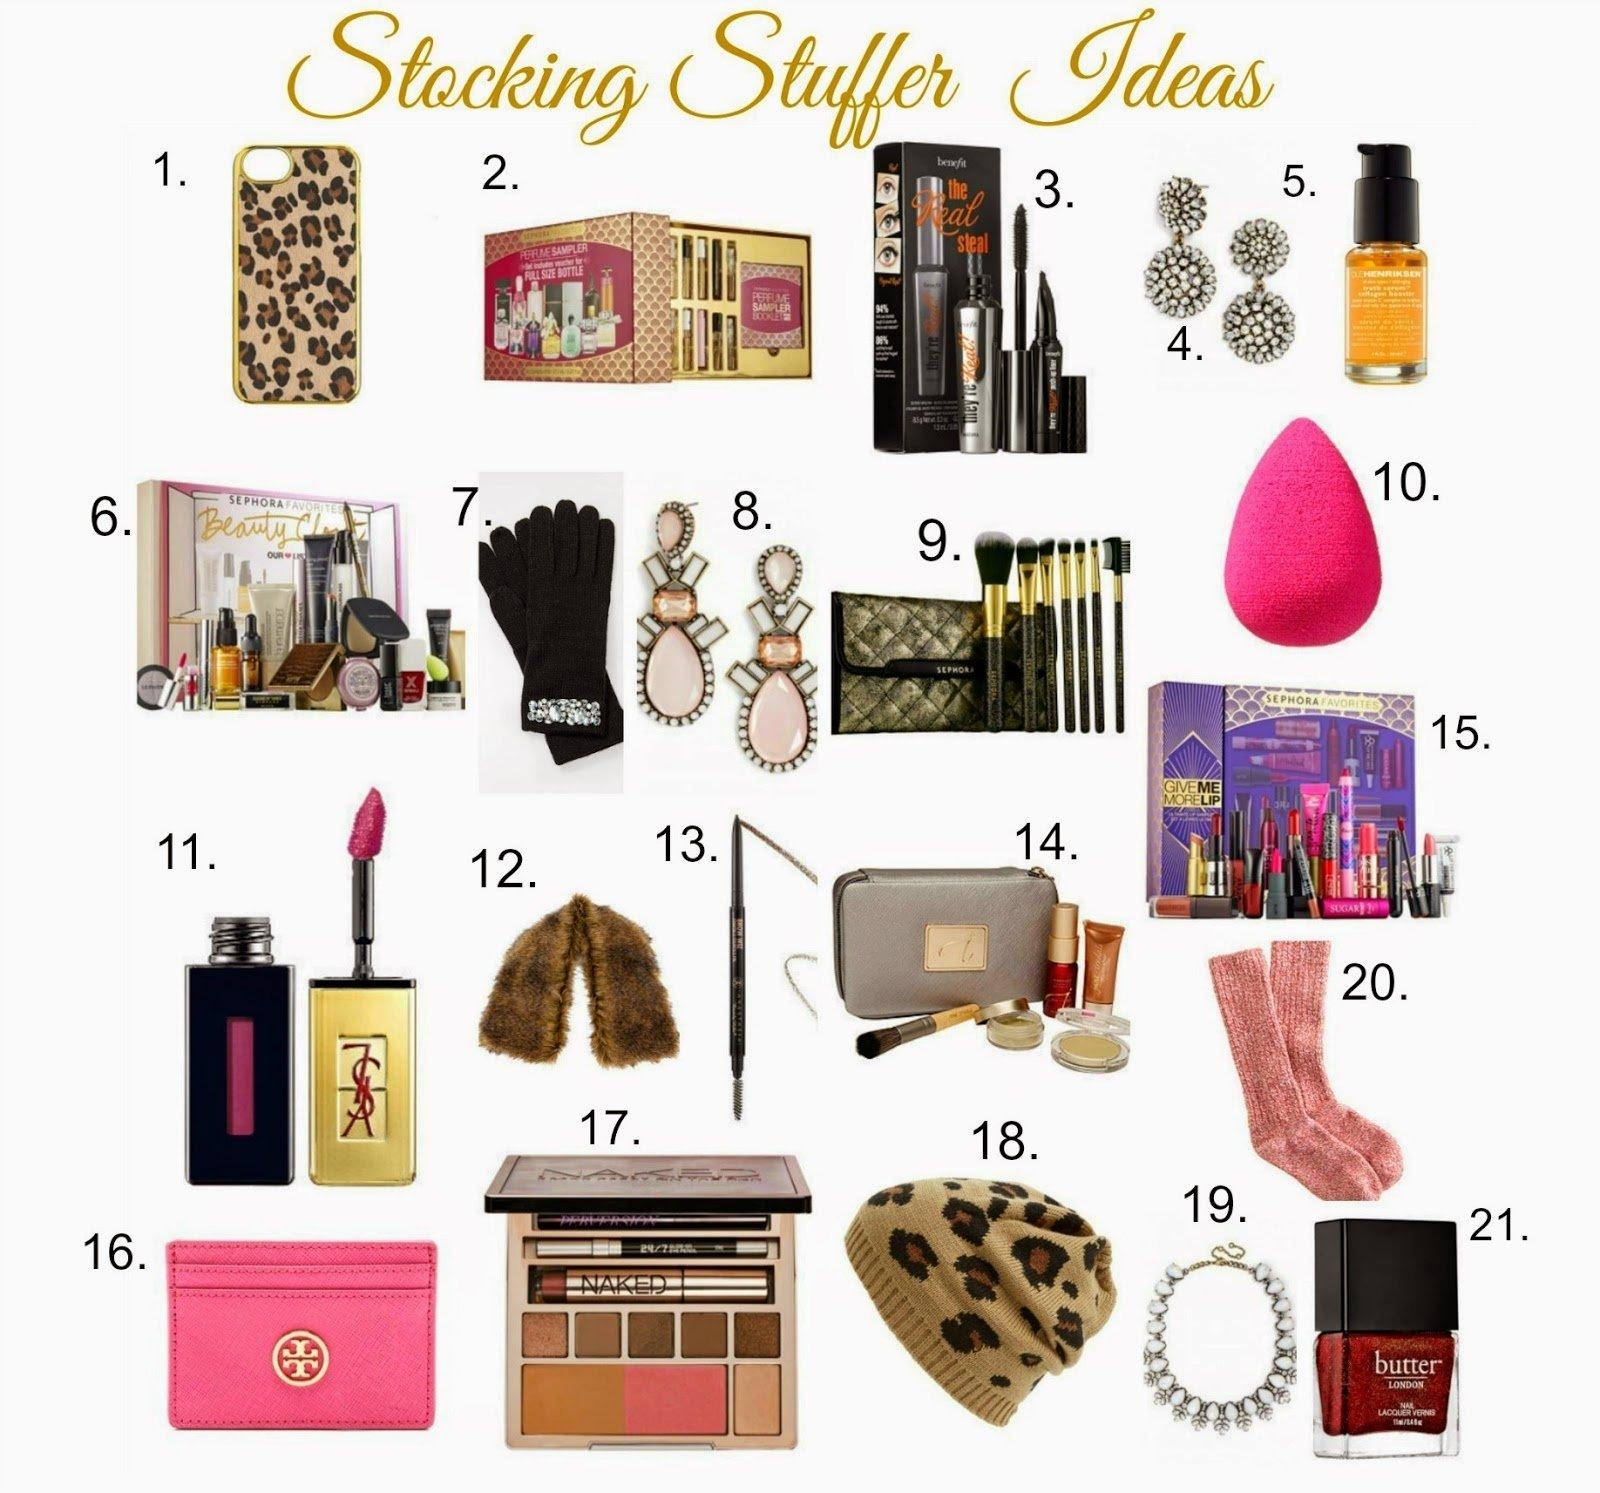 10 Stunning Stocking Stuffer Ideas For Women stocking stuffer ideas for her kiss me darling 1 2021